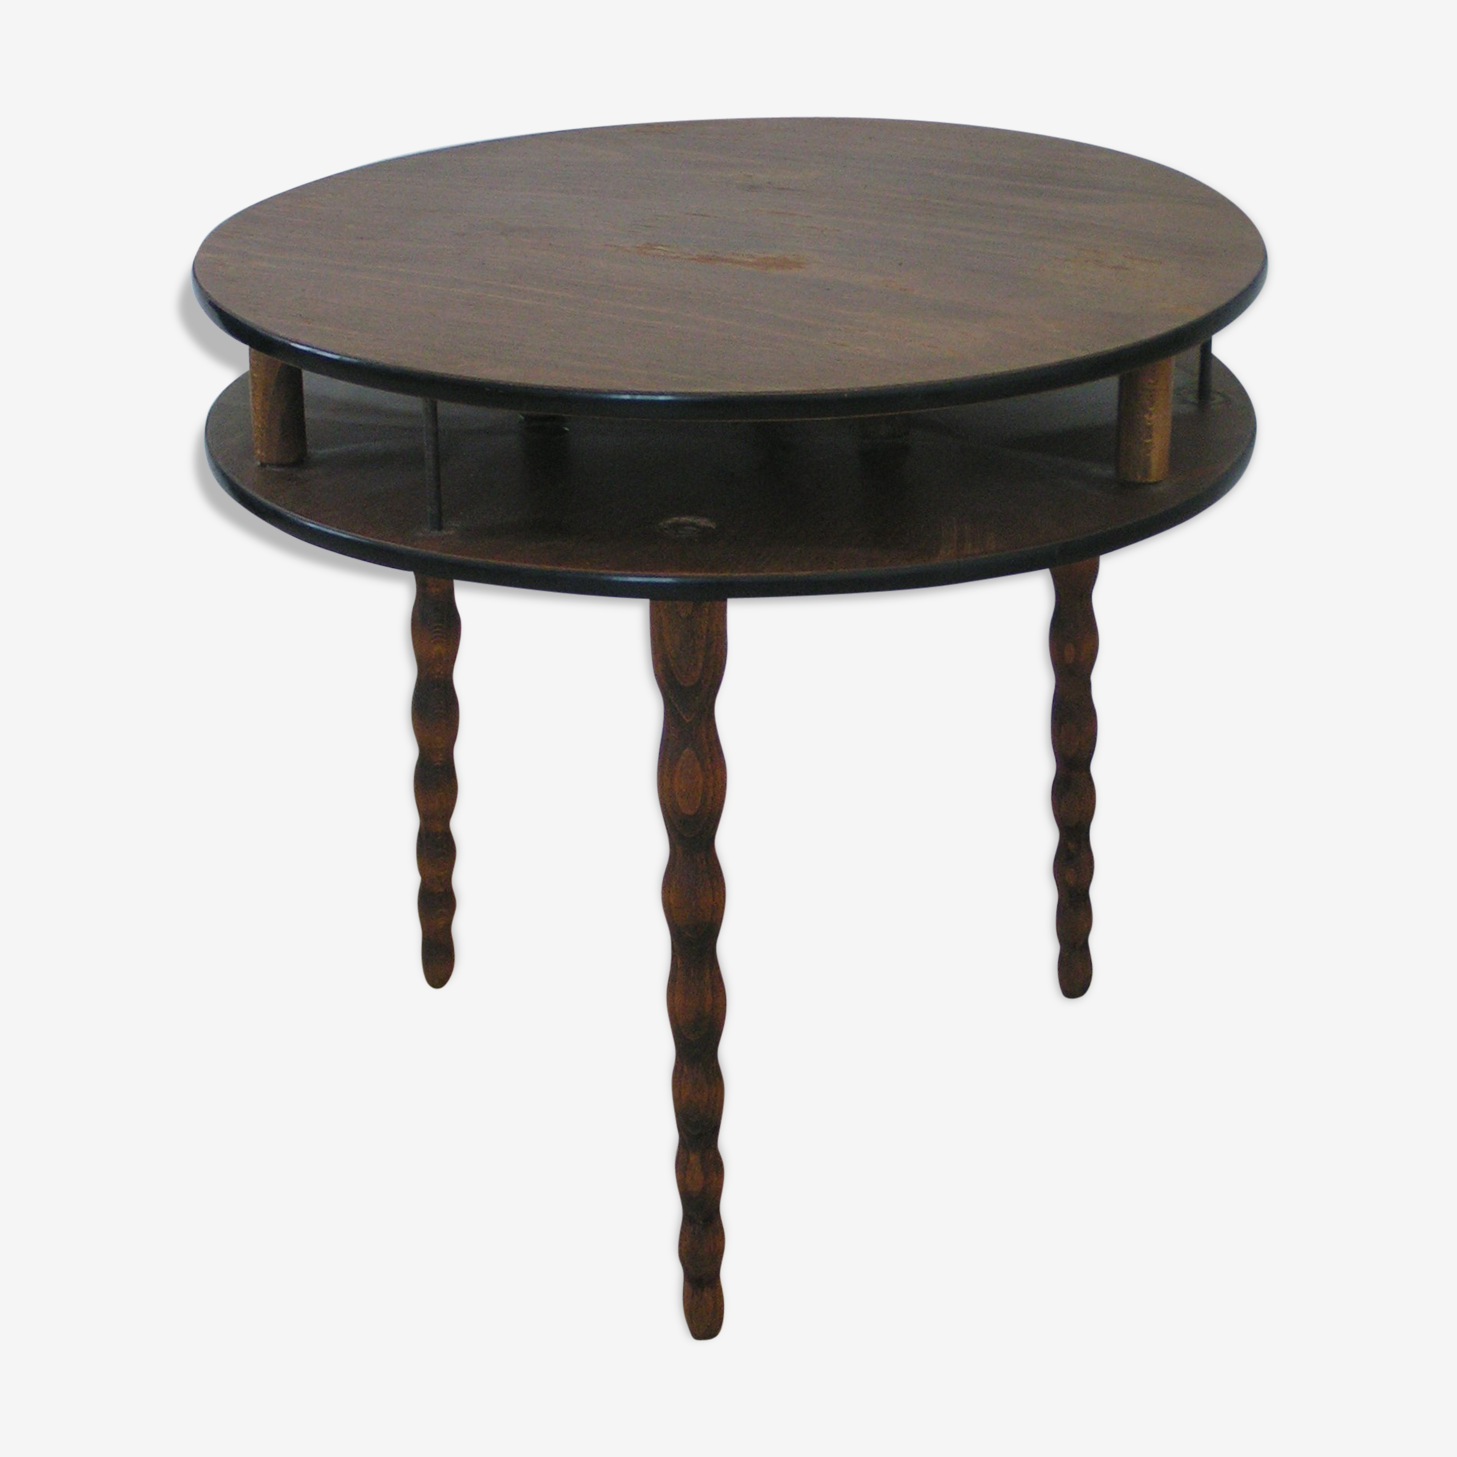 Table basse ronde en chêne années 60